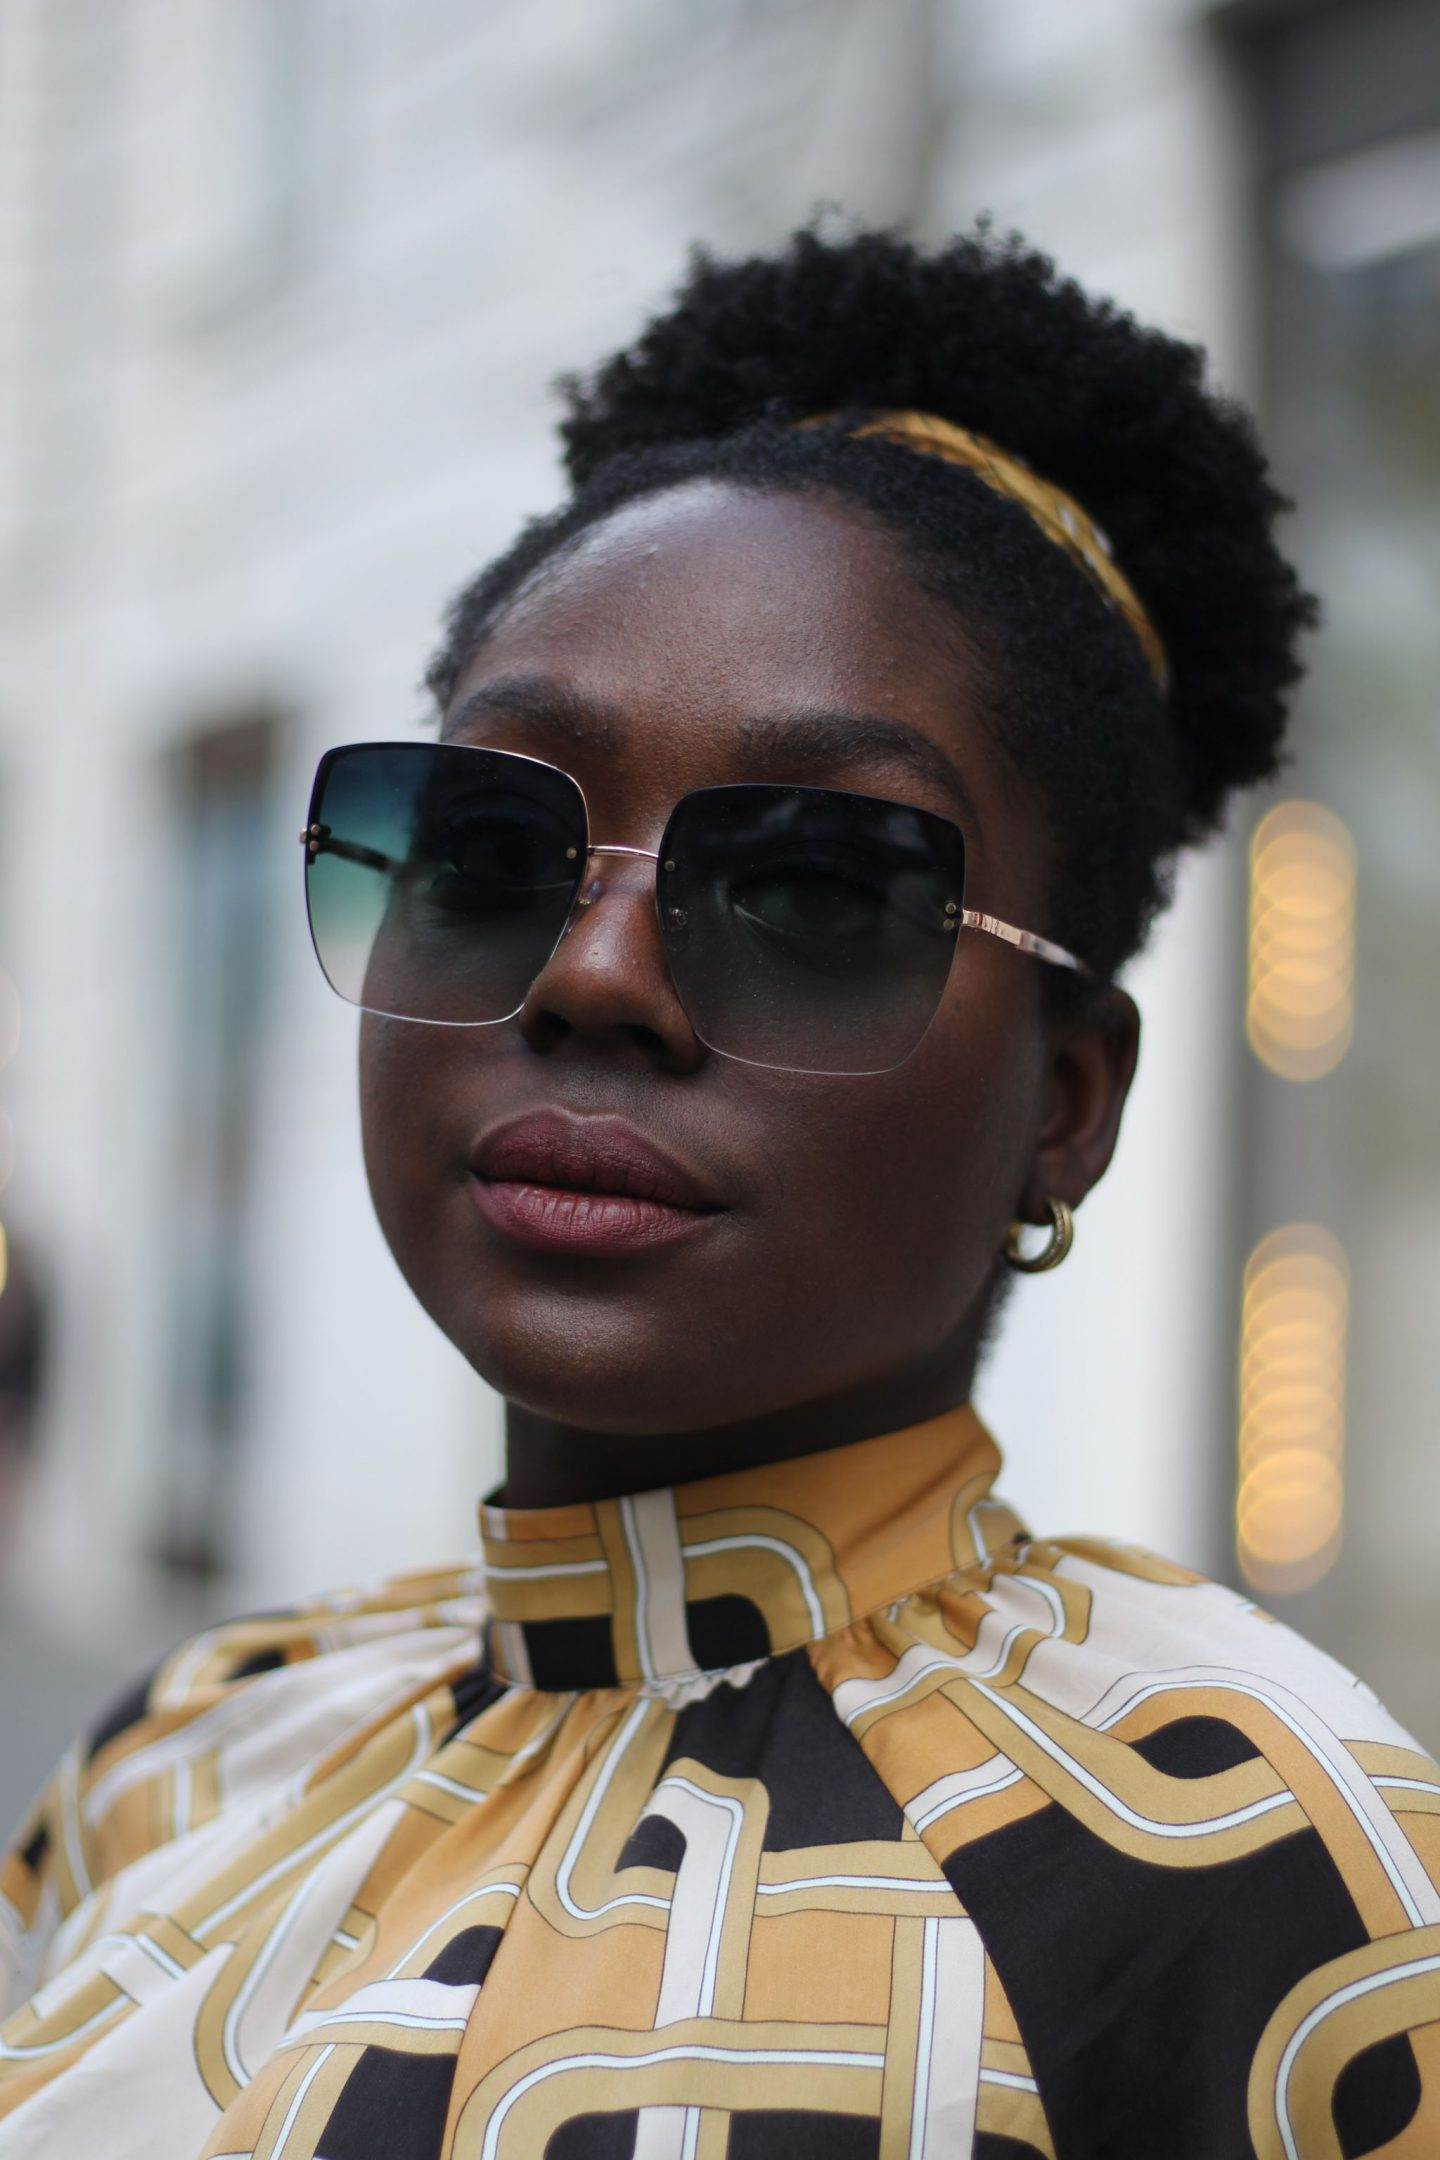 afro_hair_styles_natural_hair_Richard_Allan_HM_Lois_Opoku_streetstyle_lisforlois_4